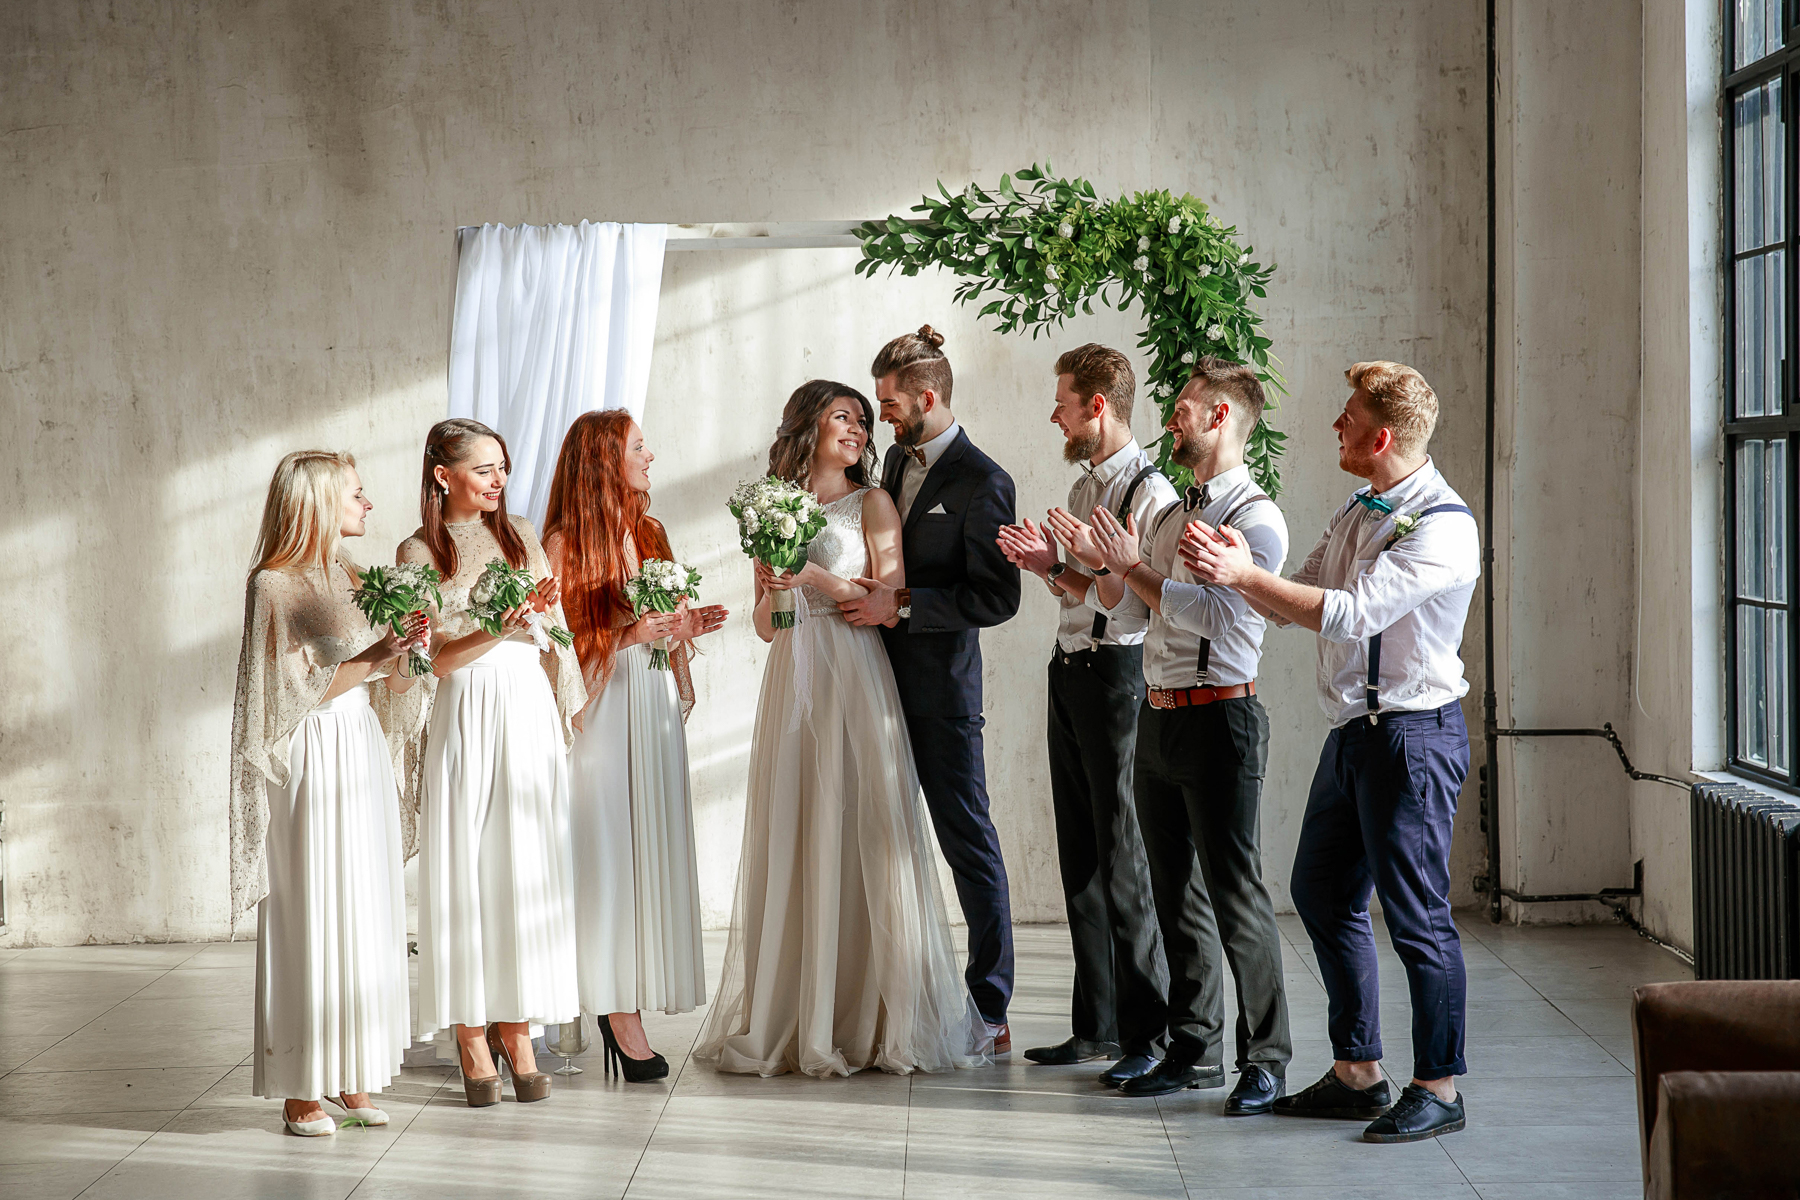 Одежда гостей на свадьбе